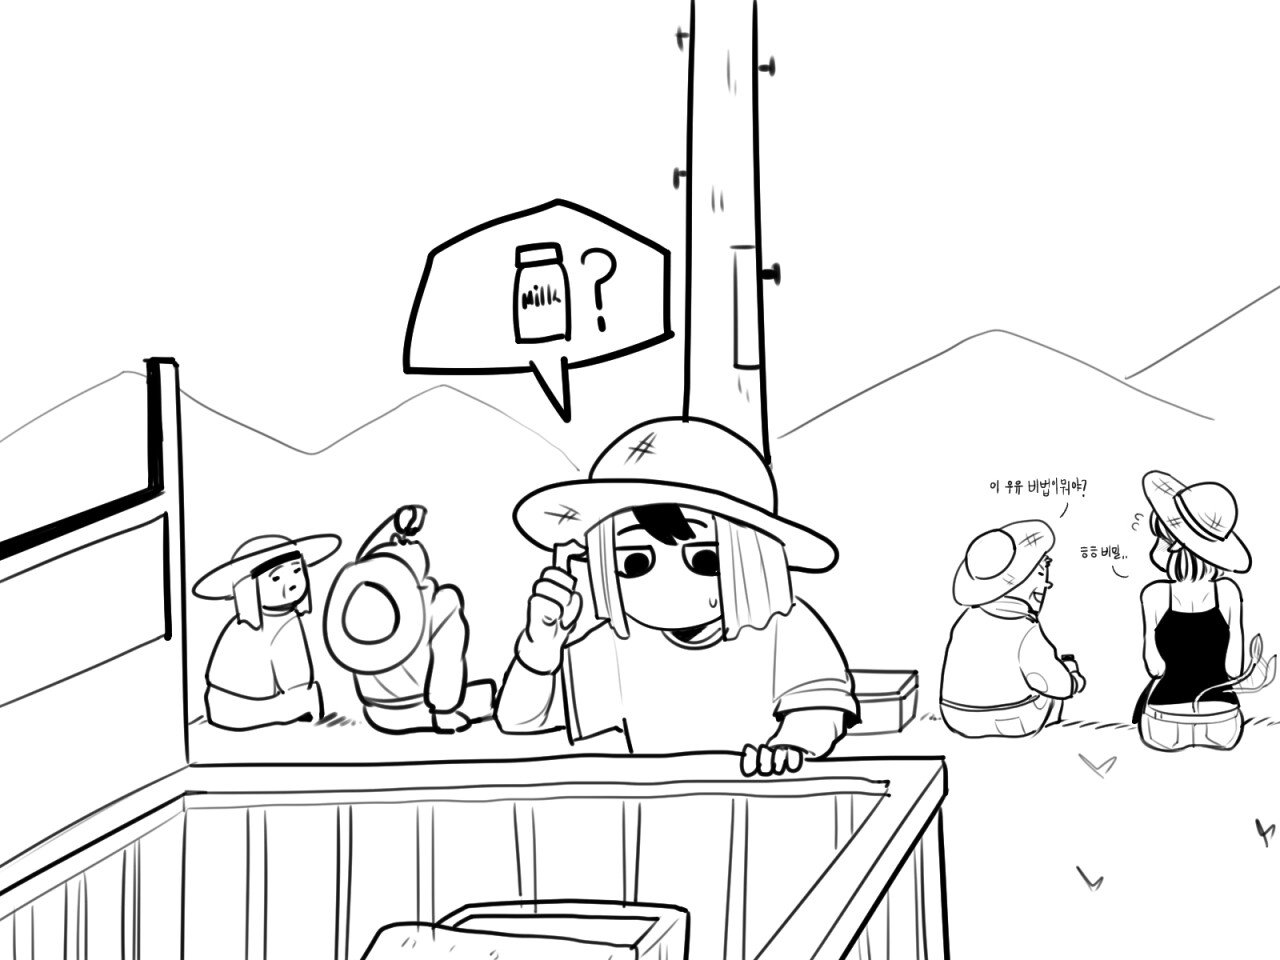 cartoon-20200407-235827-002.jpg ㅇㅎ) 우유 만드는 법.manhwa